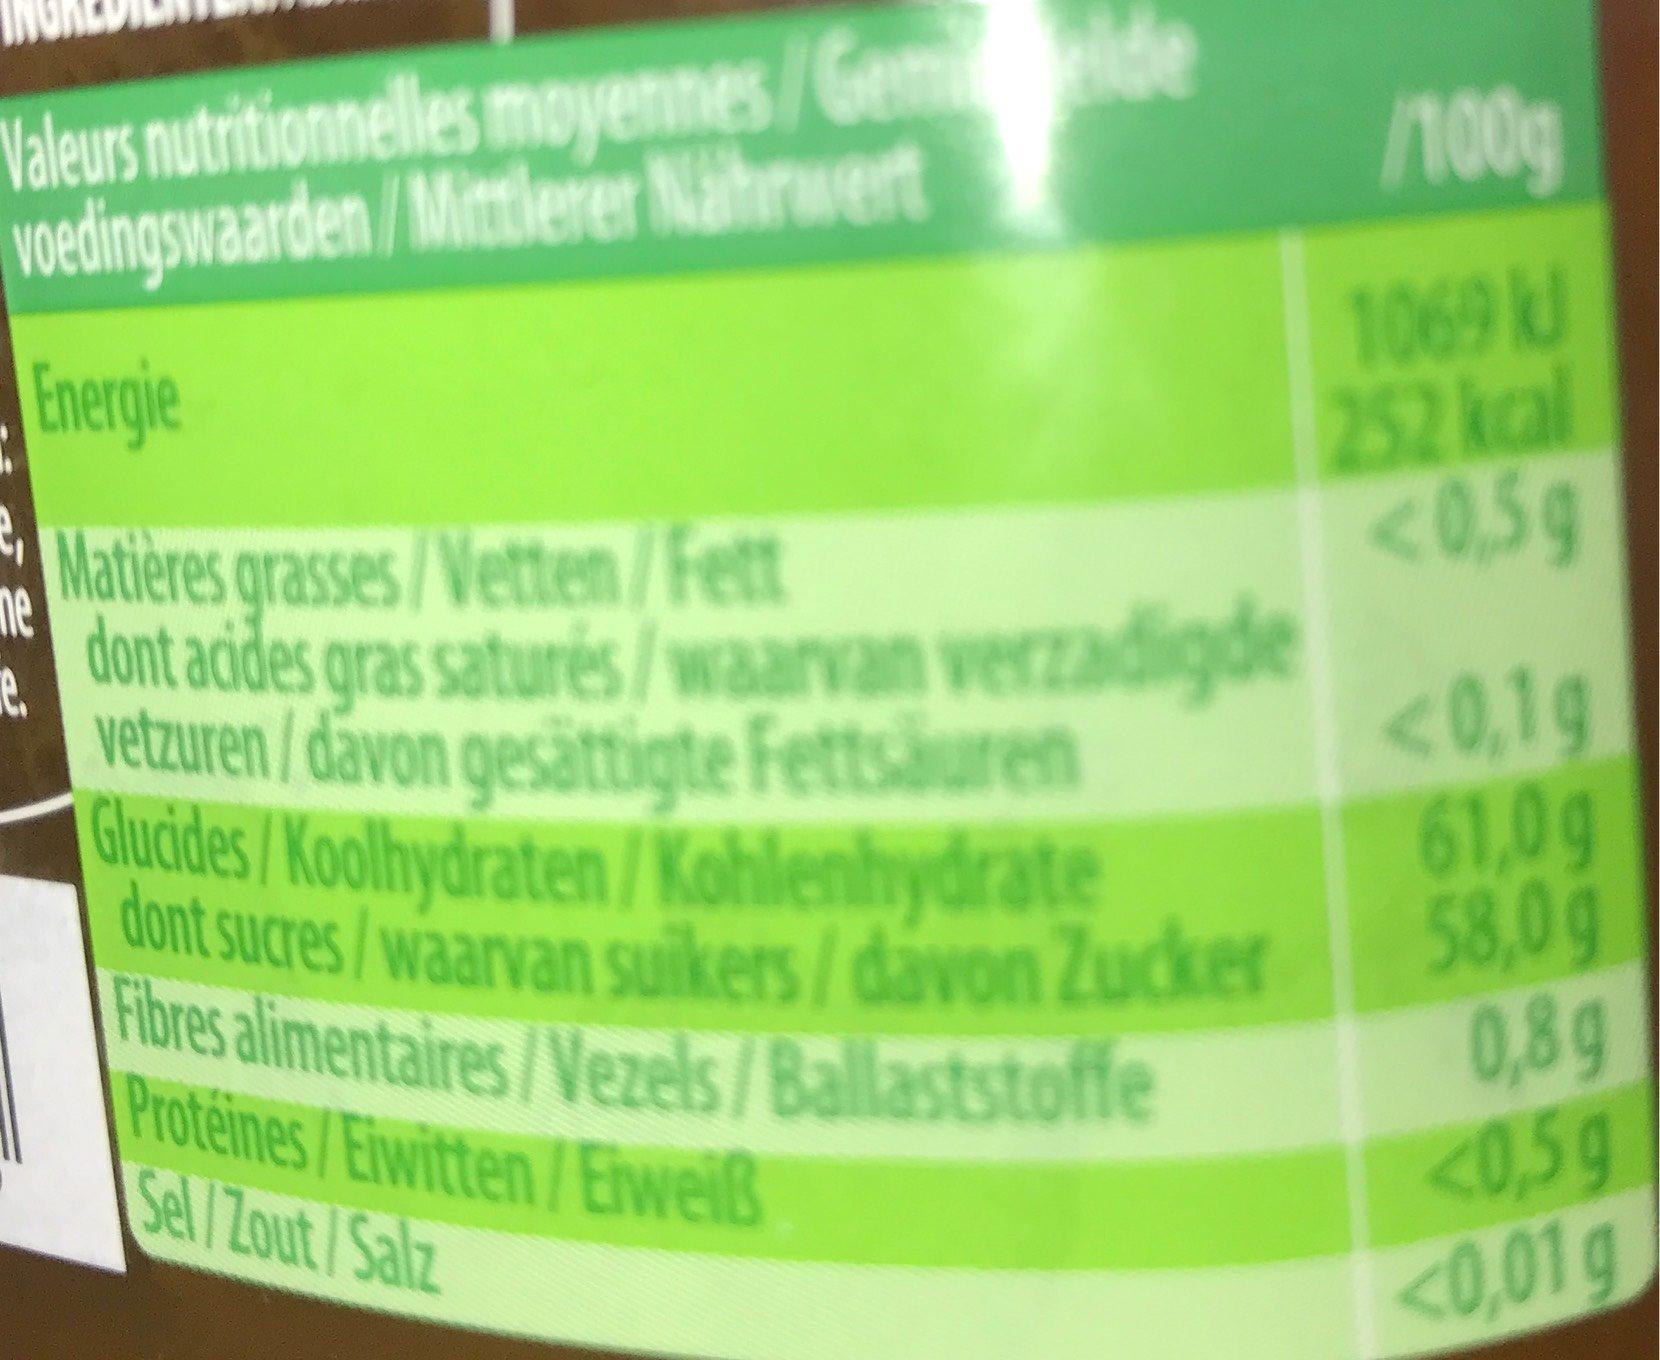 Confiture D'abricots, 450 Grammes, Marque Materne - Voedingswaarden - fr